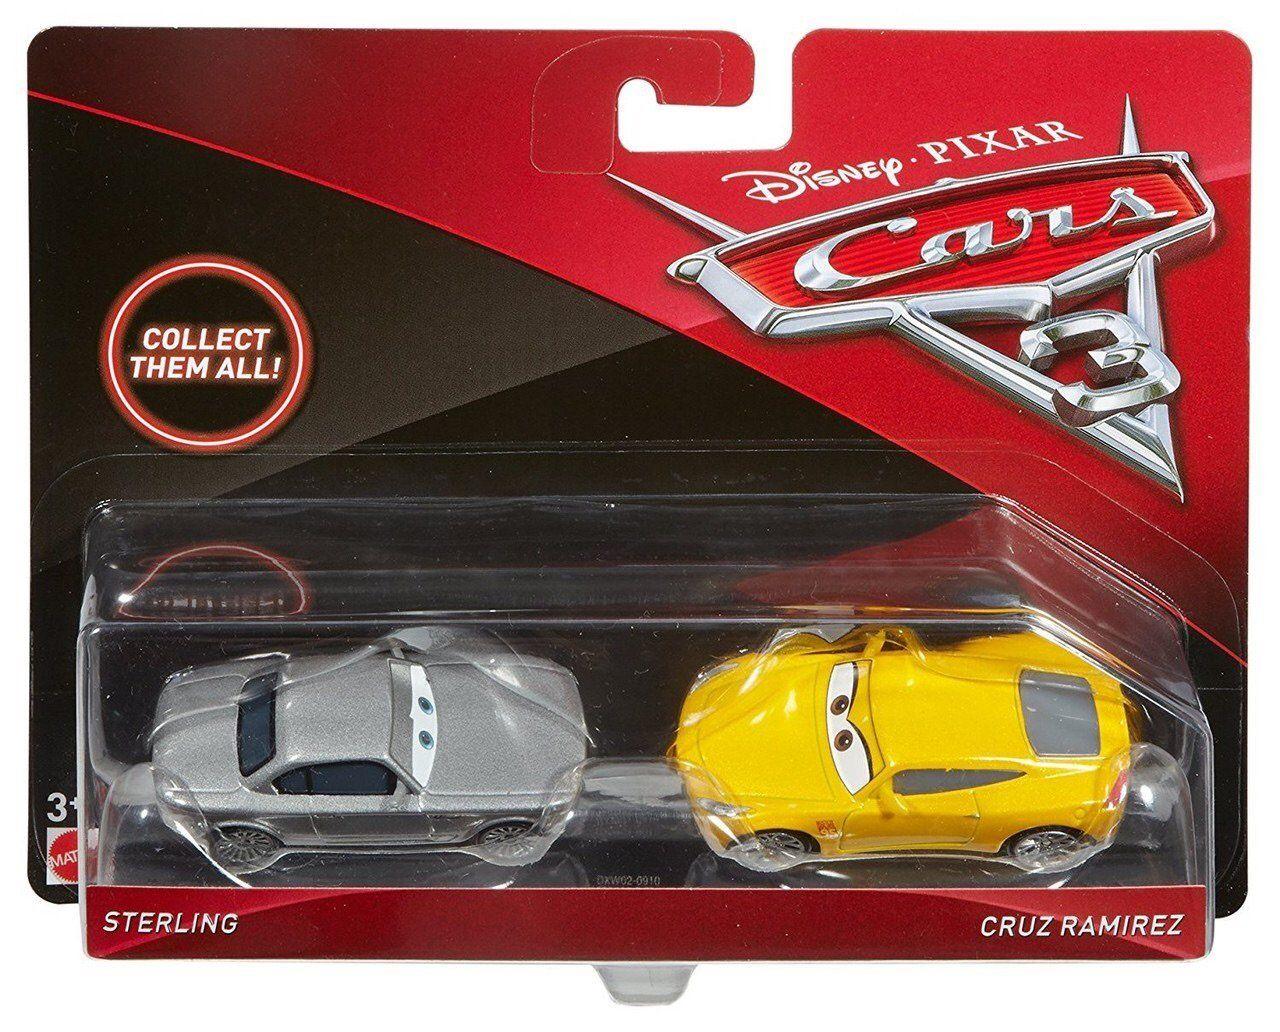 Sterling & Cruz Ramirez (Cars 3, Mattel) Cruz ramirez